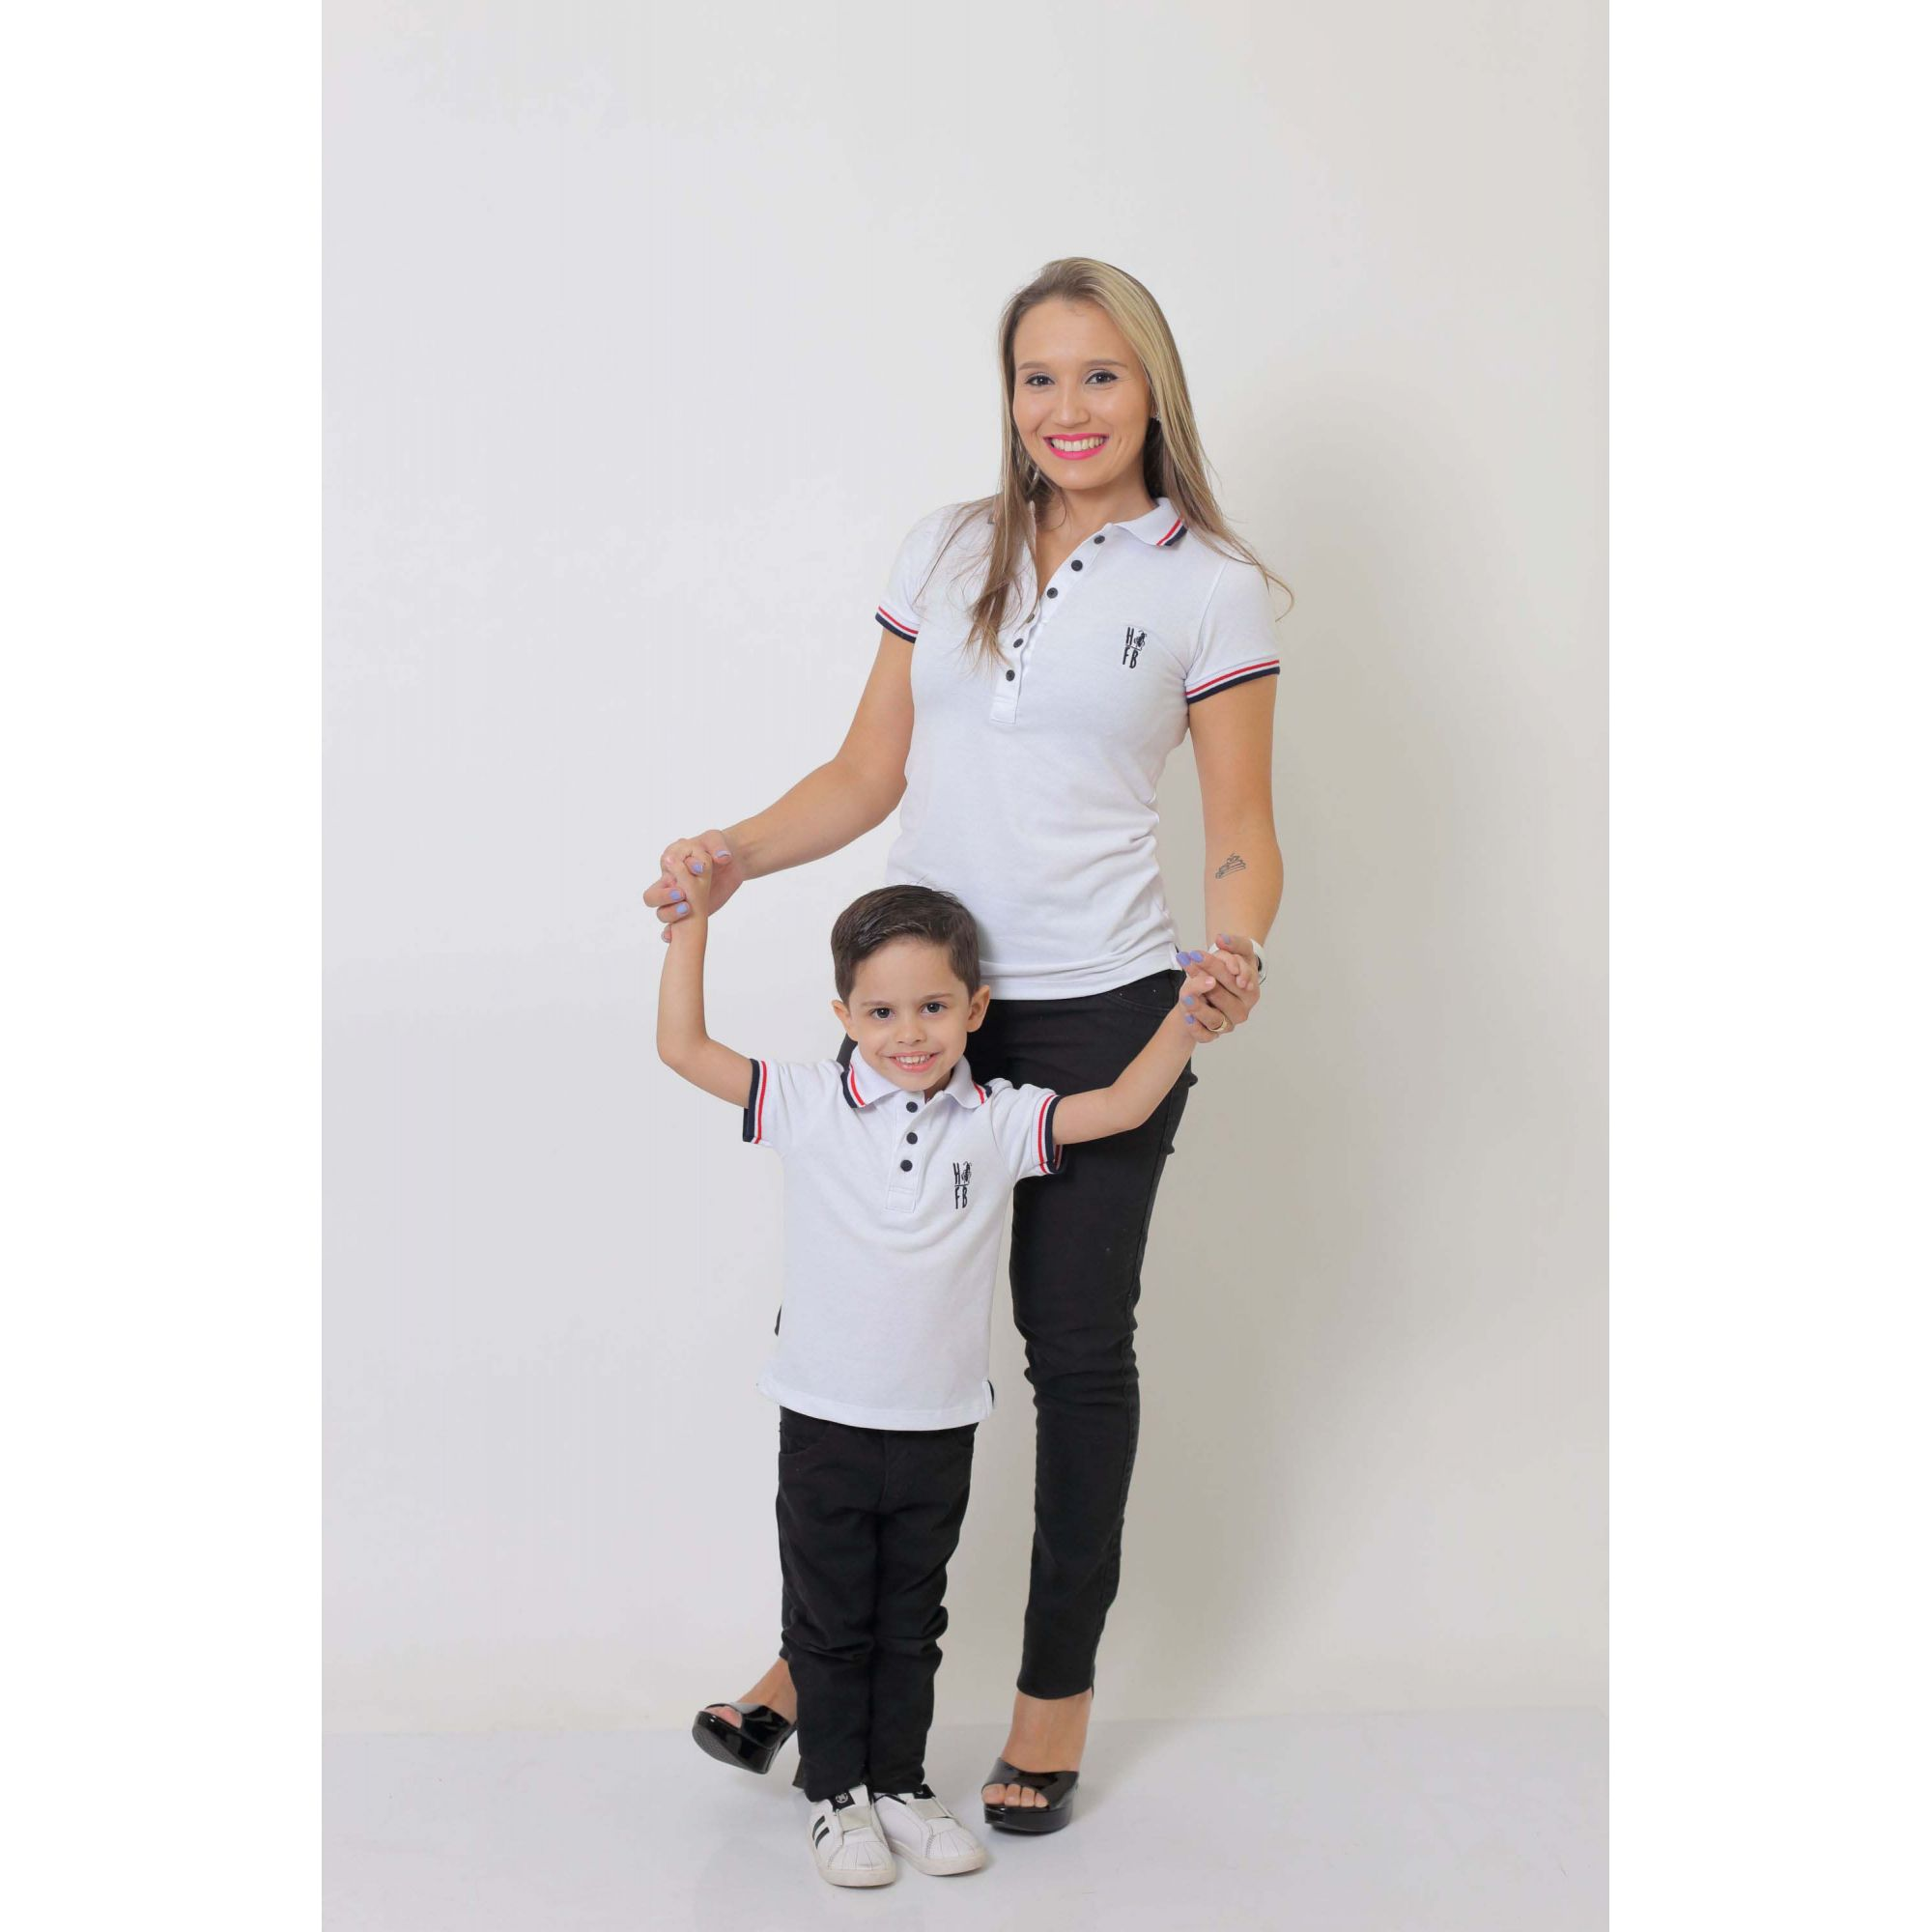 MÃE E FILHO > Kit 02 peças - Camisas ou Body Polo Branca   [Coleção Tal Mãe Tal Filho]